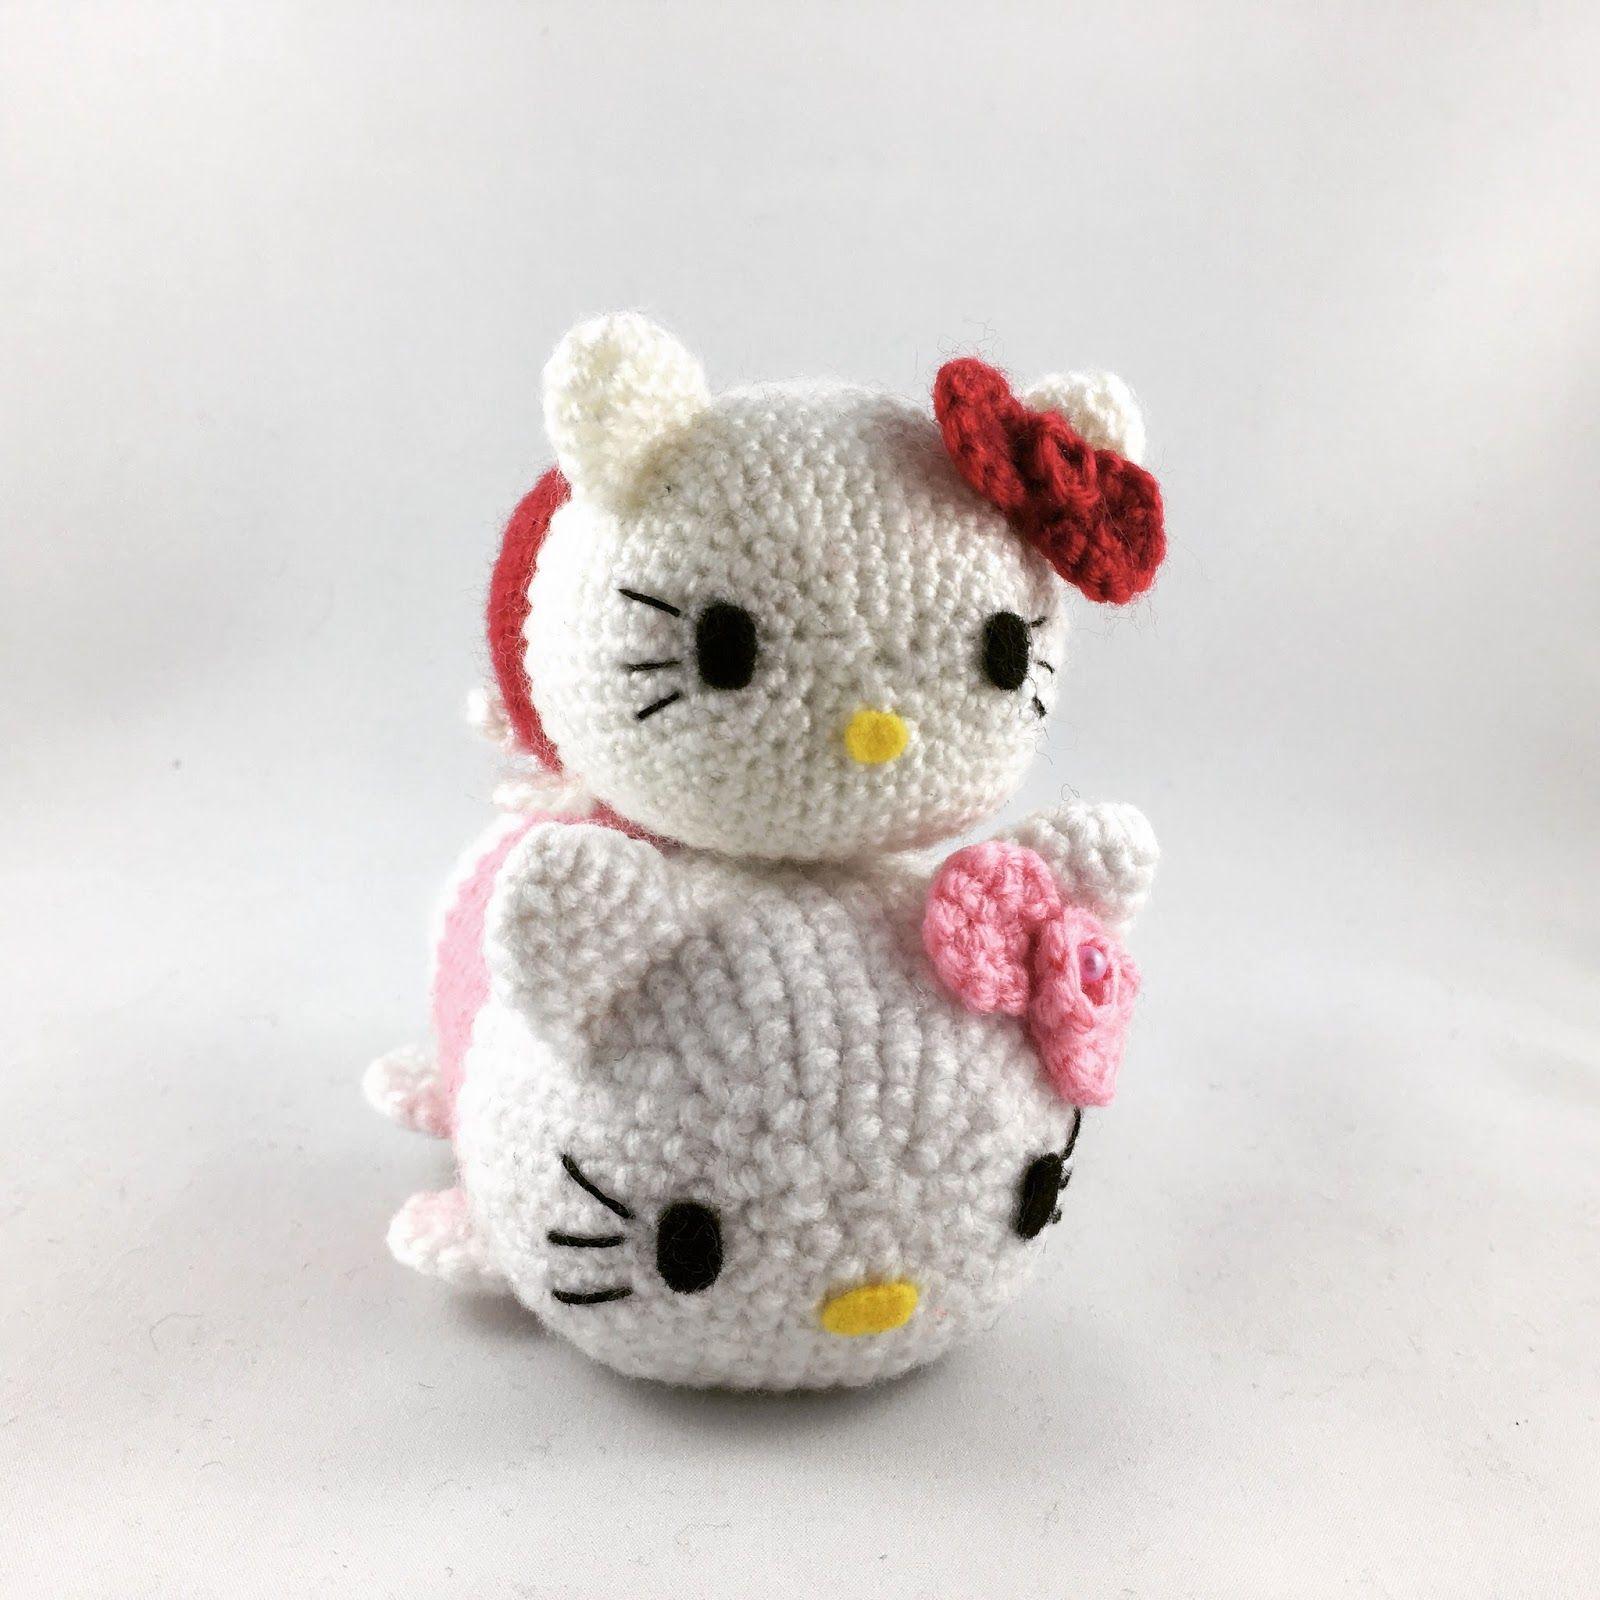 A blog about crafting, crochet, and amigurumi | amigurumi ...